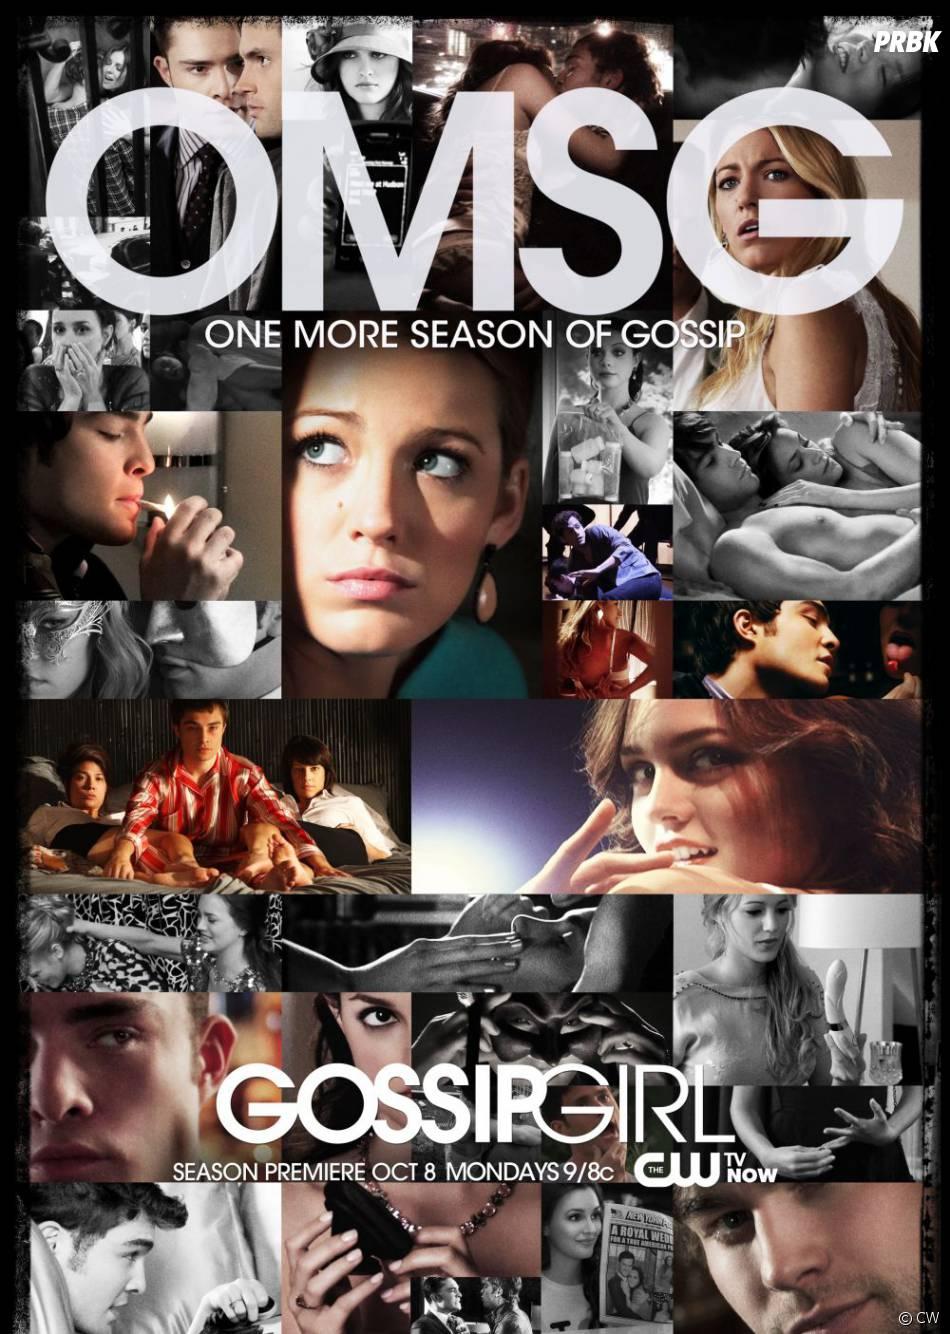 La saison 6 de Gossip Girl sera la dernière